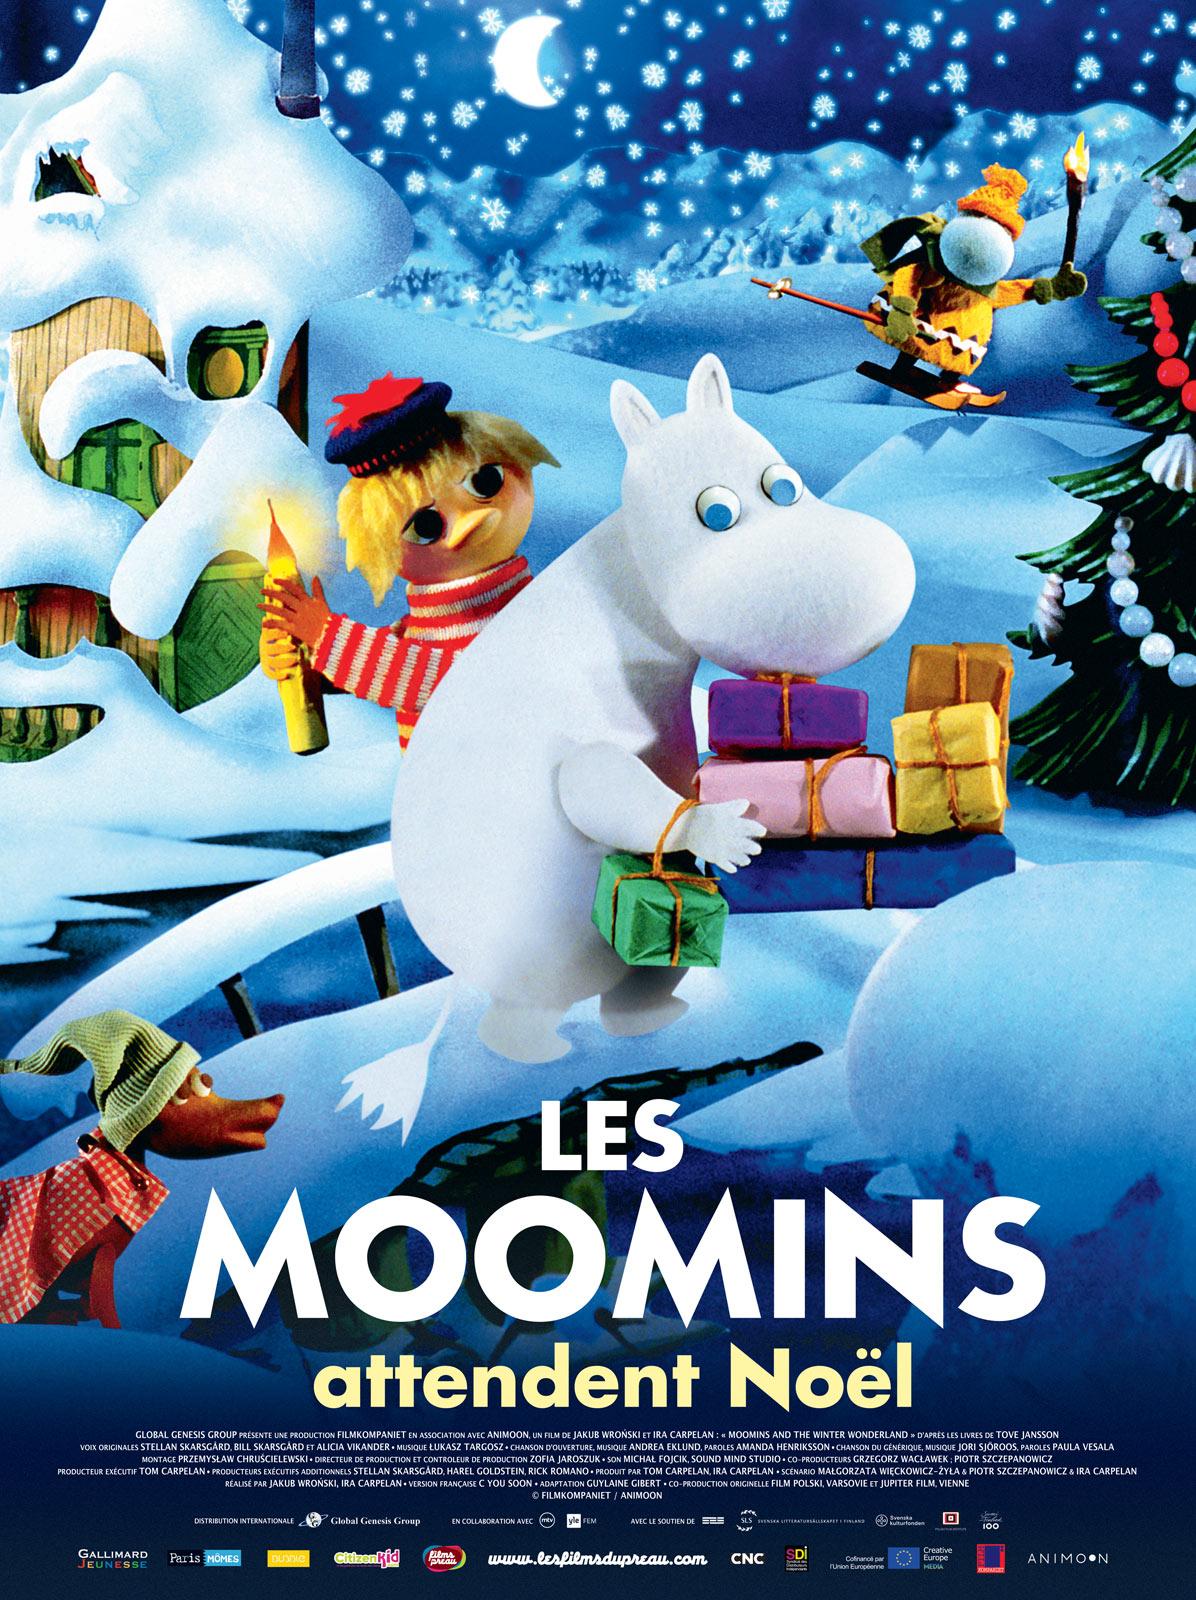 dessin anime noel 2018 cinema Les Moomins attendent Noël   film 2017   AlloCiné dessin anime noel 2018 cinema